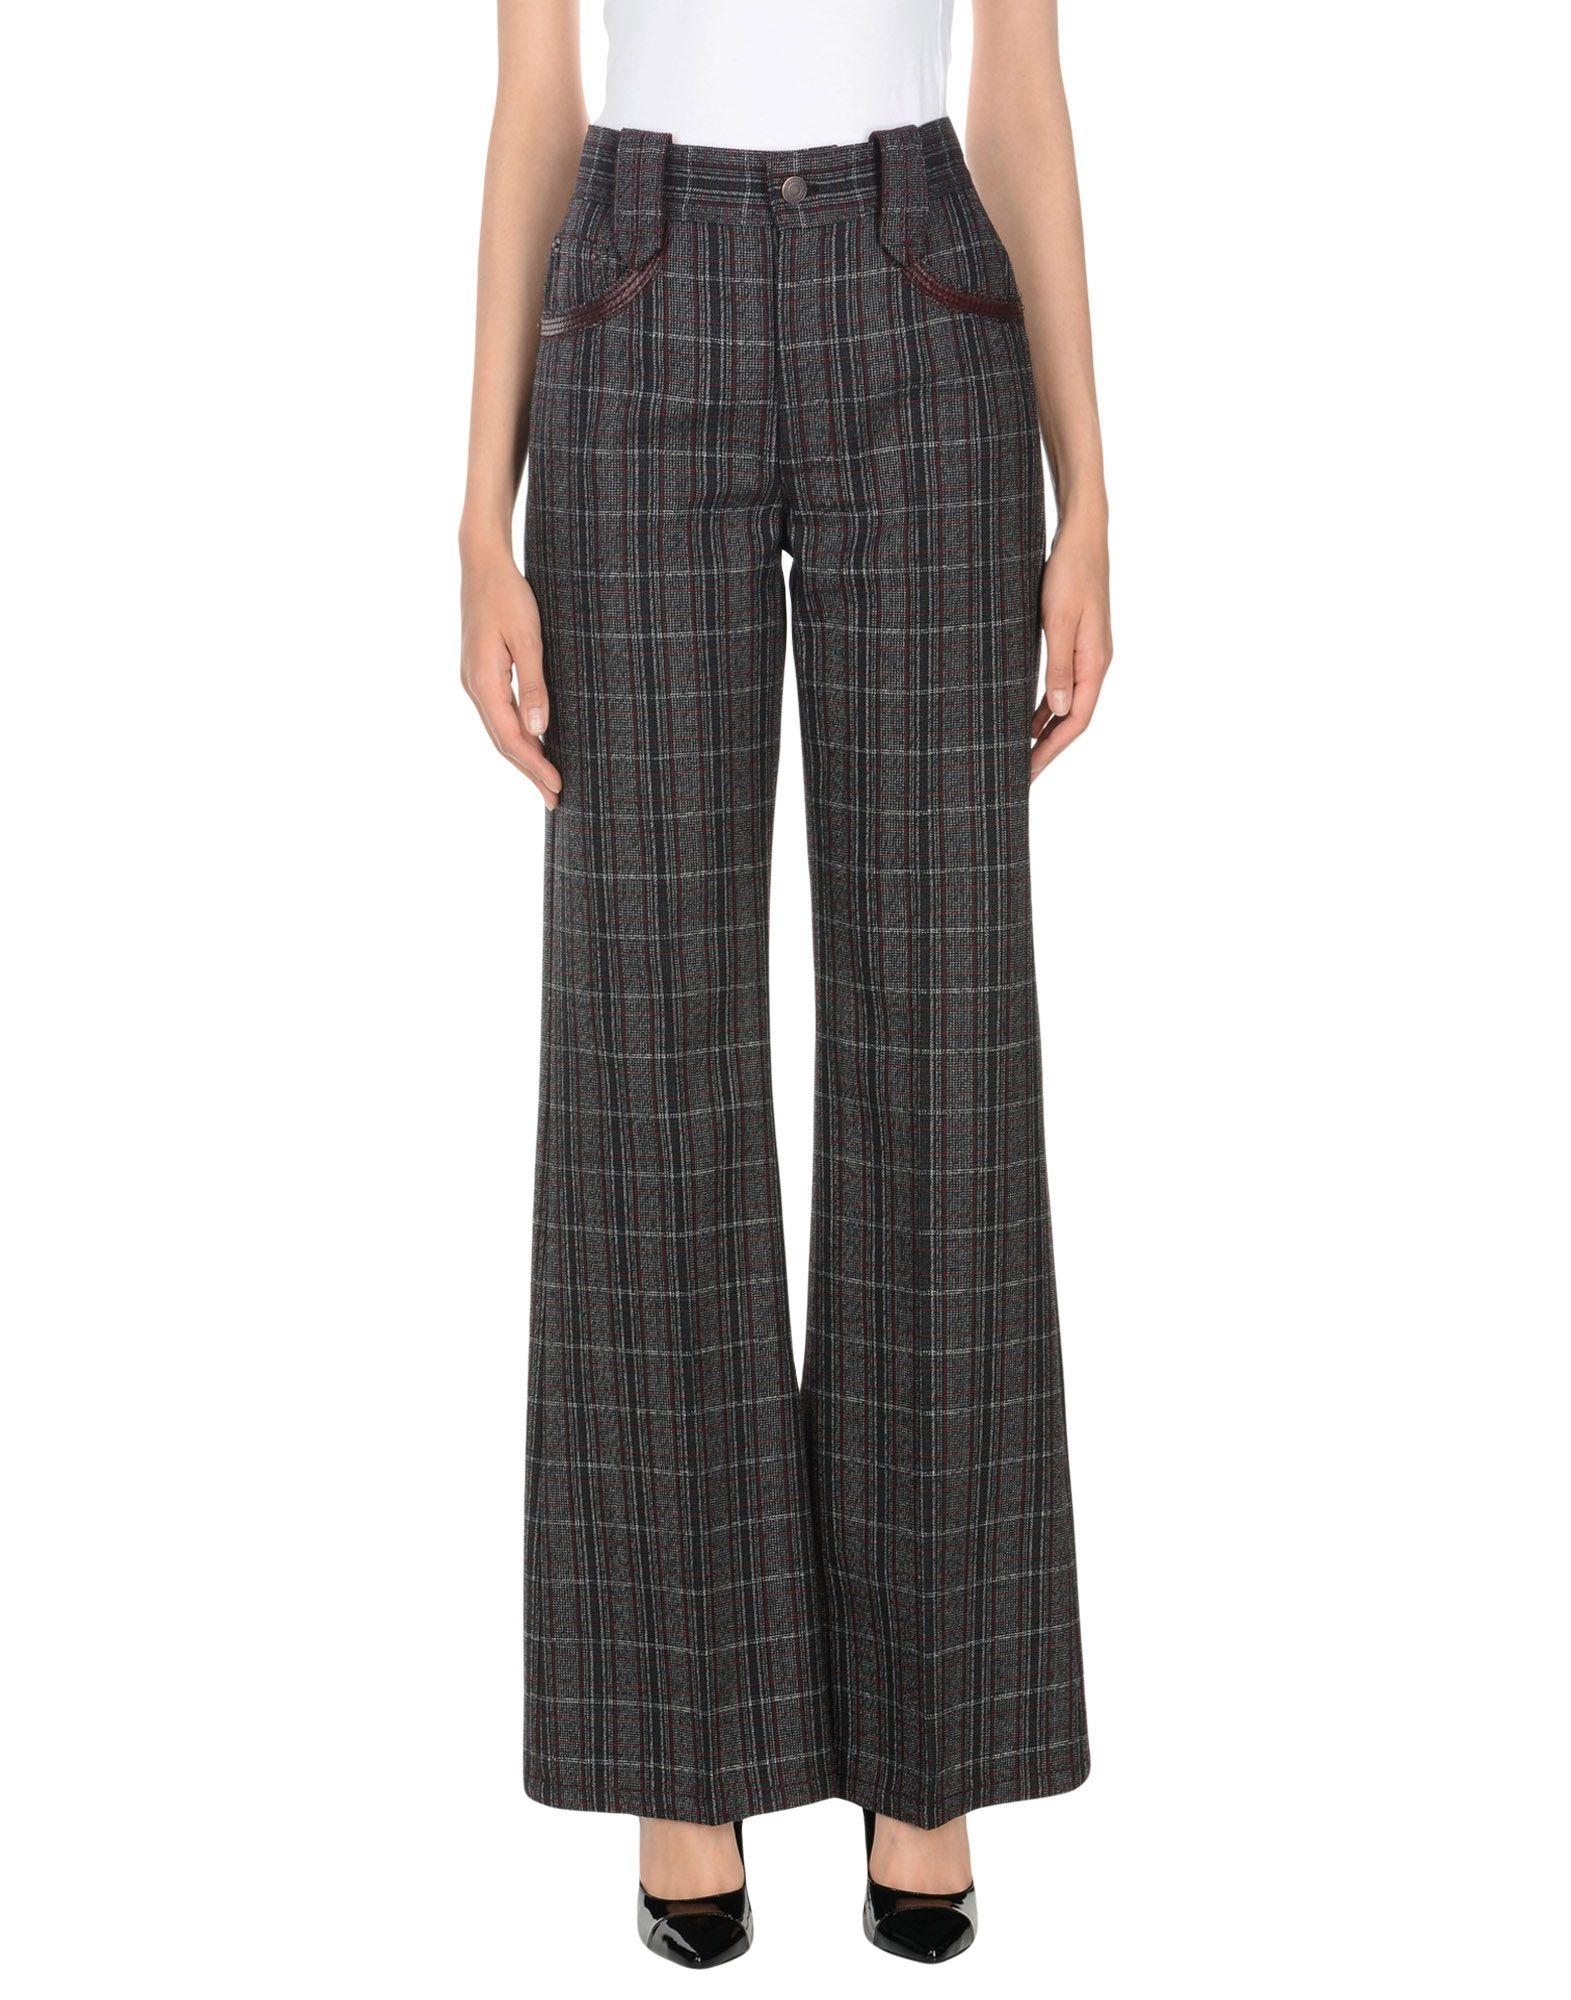 Pantalone Marc Jacobs Donna - Acquista online su